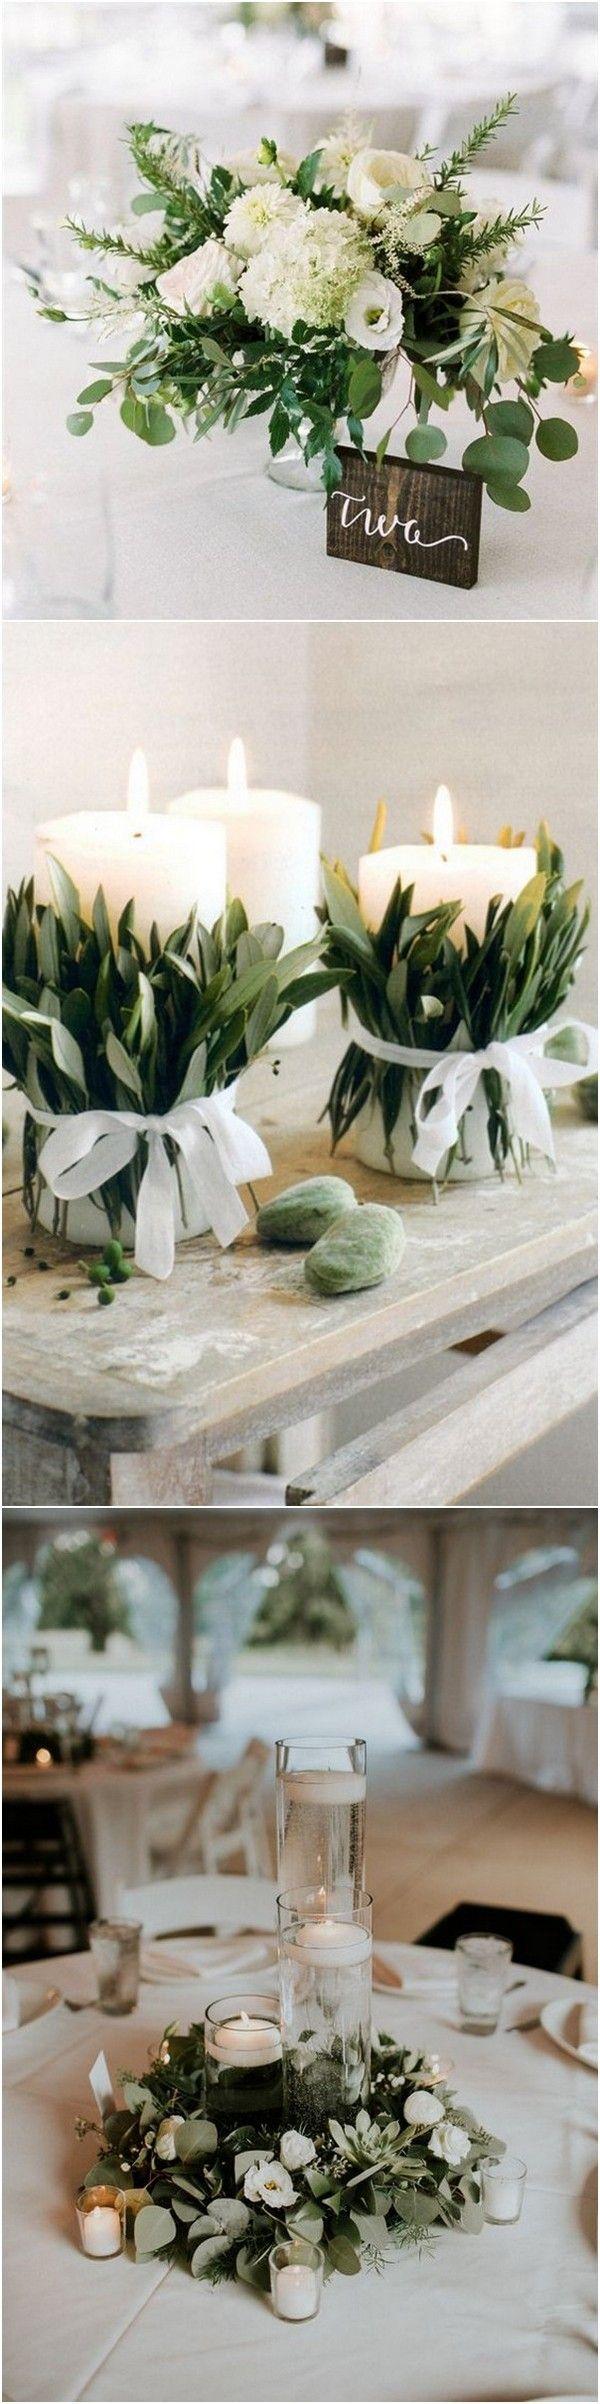 elegant rose hydrangea greenery chic wedding centerpiece ideas 2 #weddingtrends #weddingideas #weddingdecor #weddingcenterpiece #greenerywedding